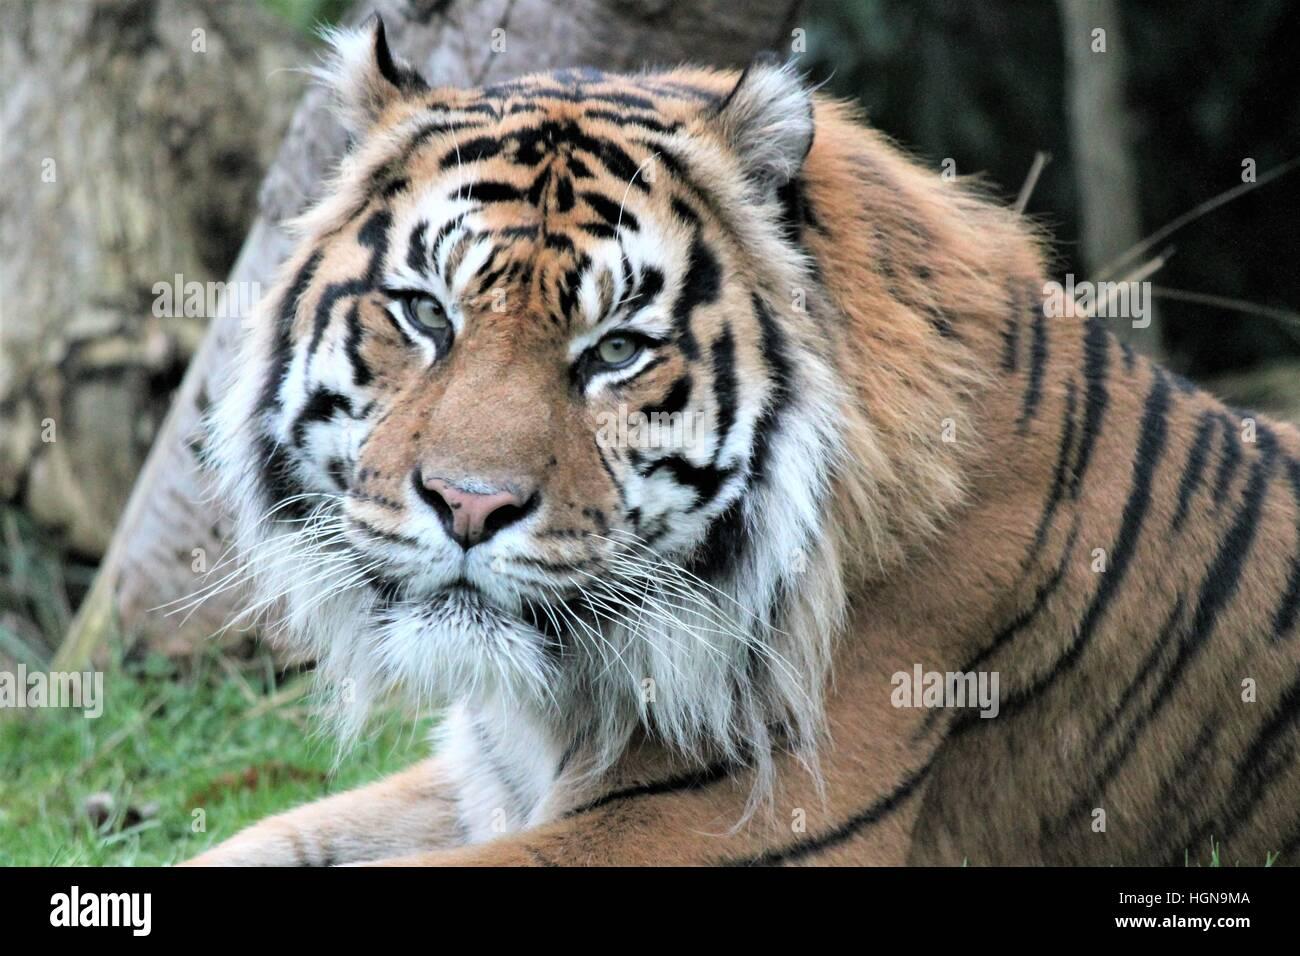 tiger : Sumatran tiger (Panthera tigris sumatrae) is a rare tiger subspecies that inhabits the Indonesian island Stock Photo